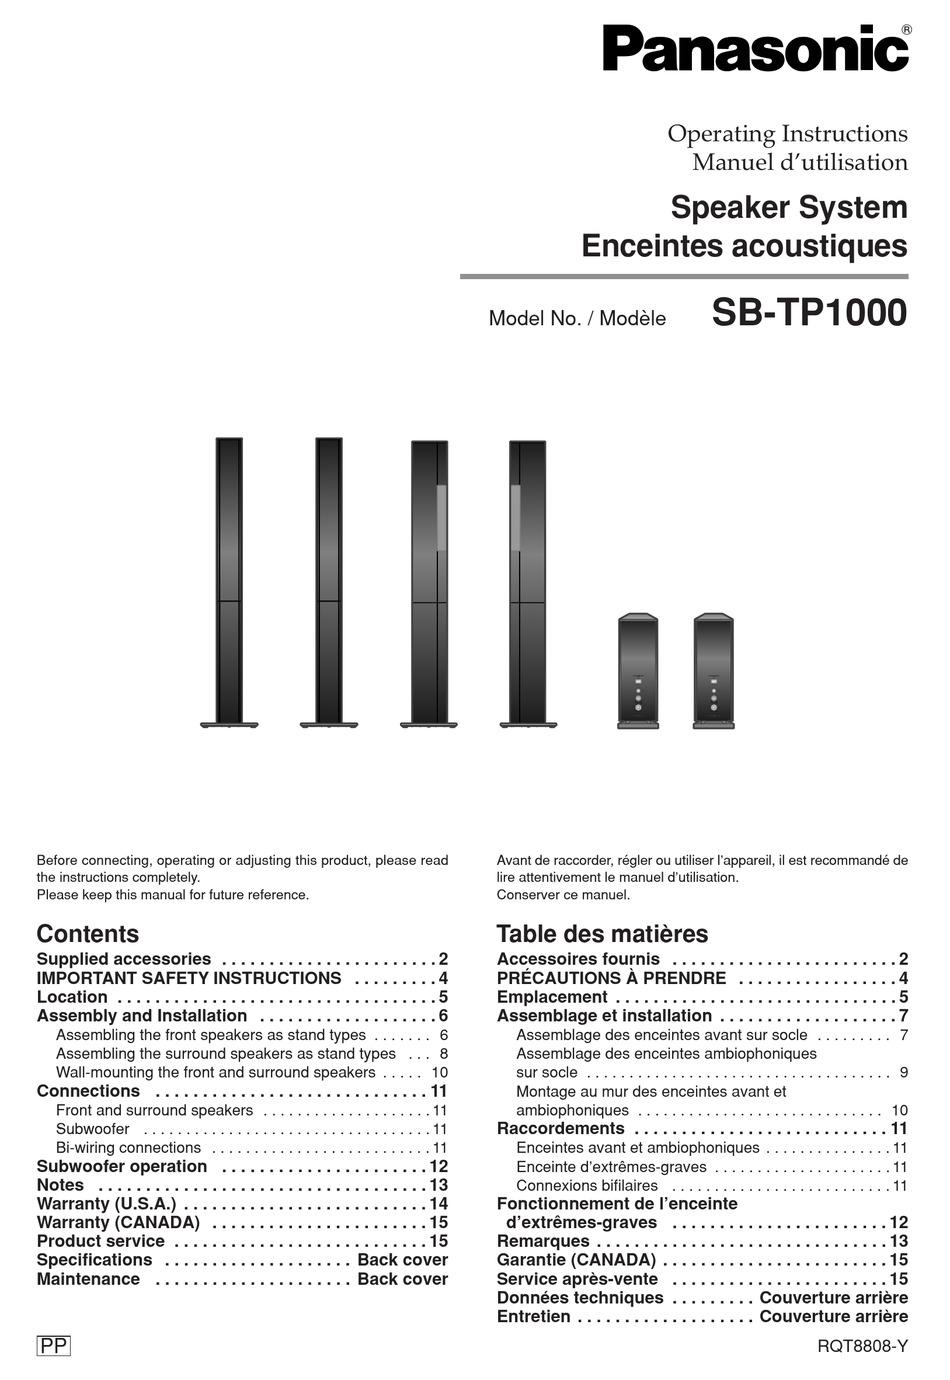 PANASONIC SB-TP1000 OPERATING INSTRUCTIONS MANUAL Pdf